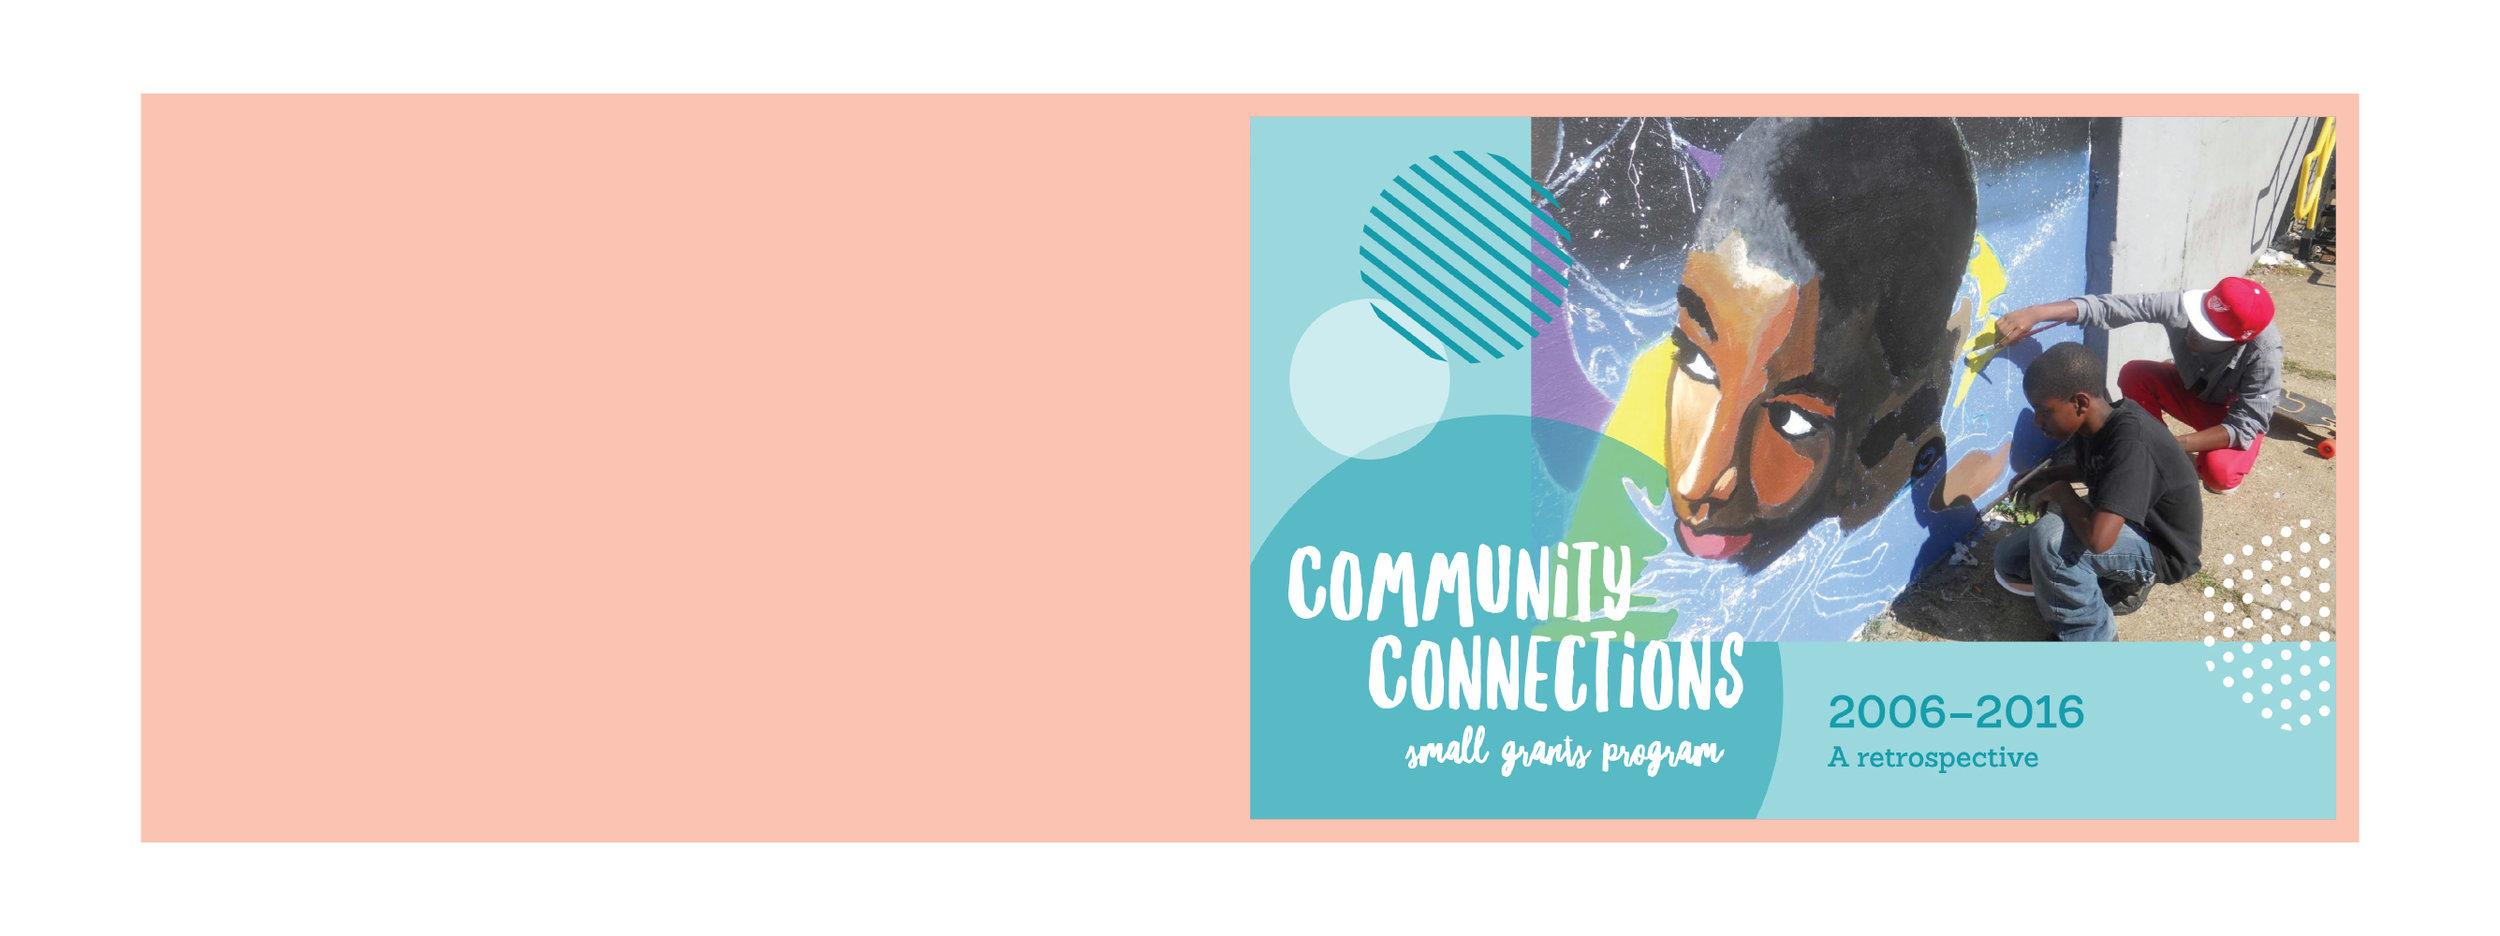 CommunityConnections_4.jpg